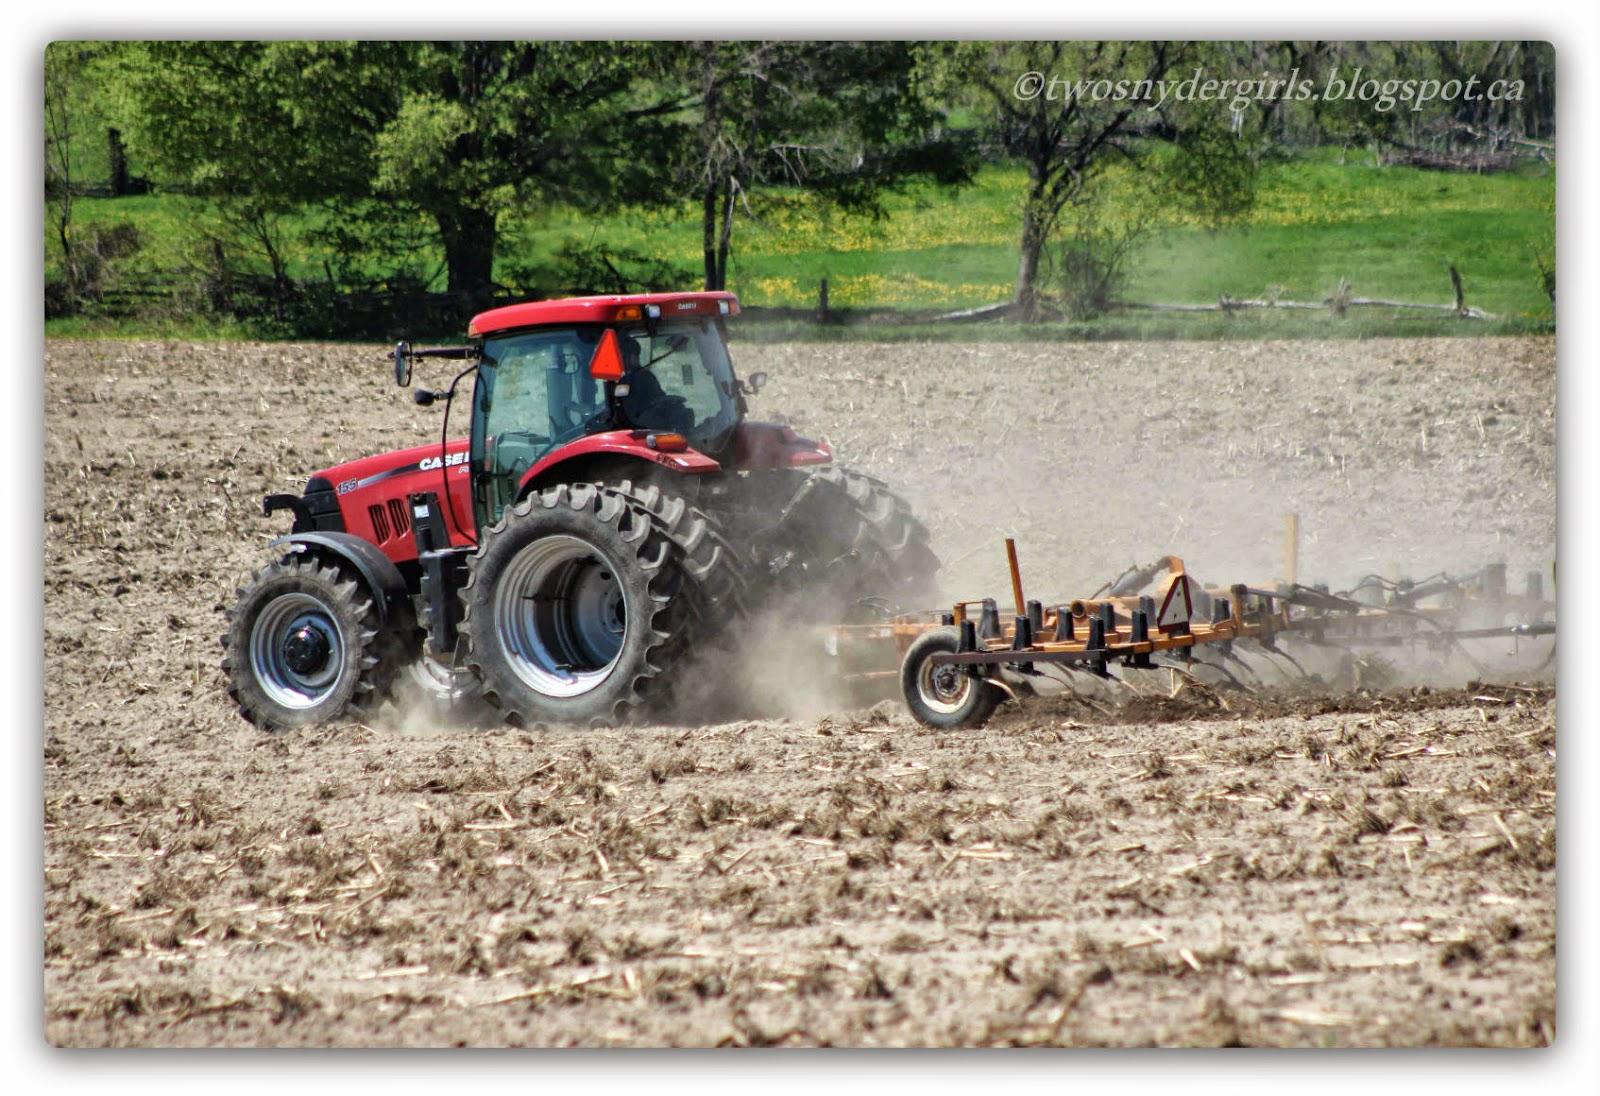 Trackor plowing